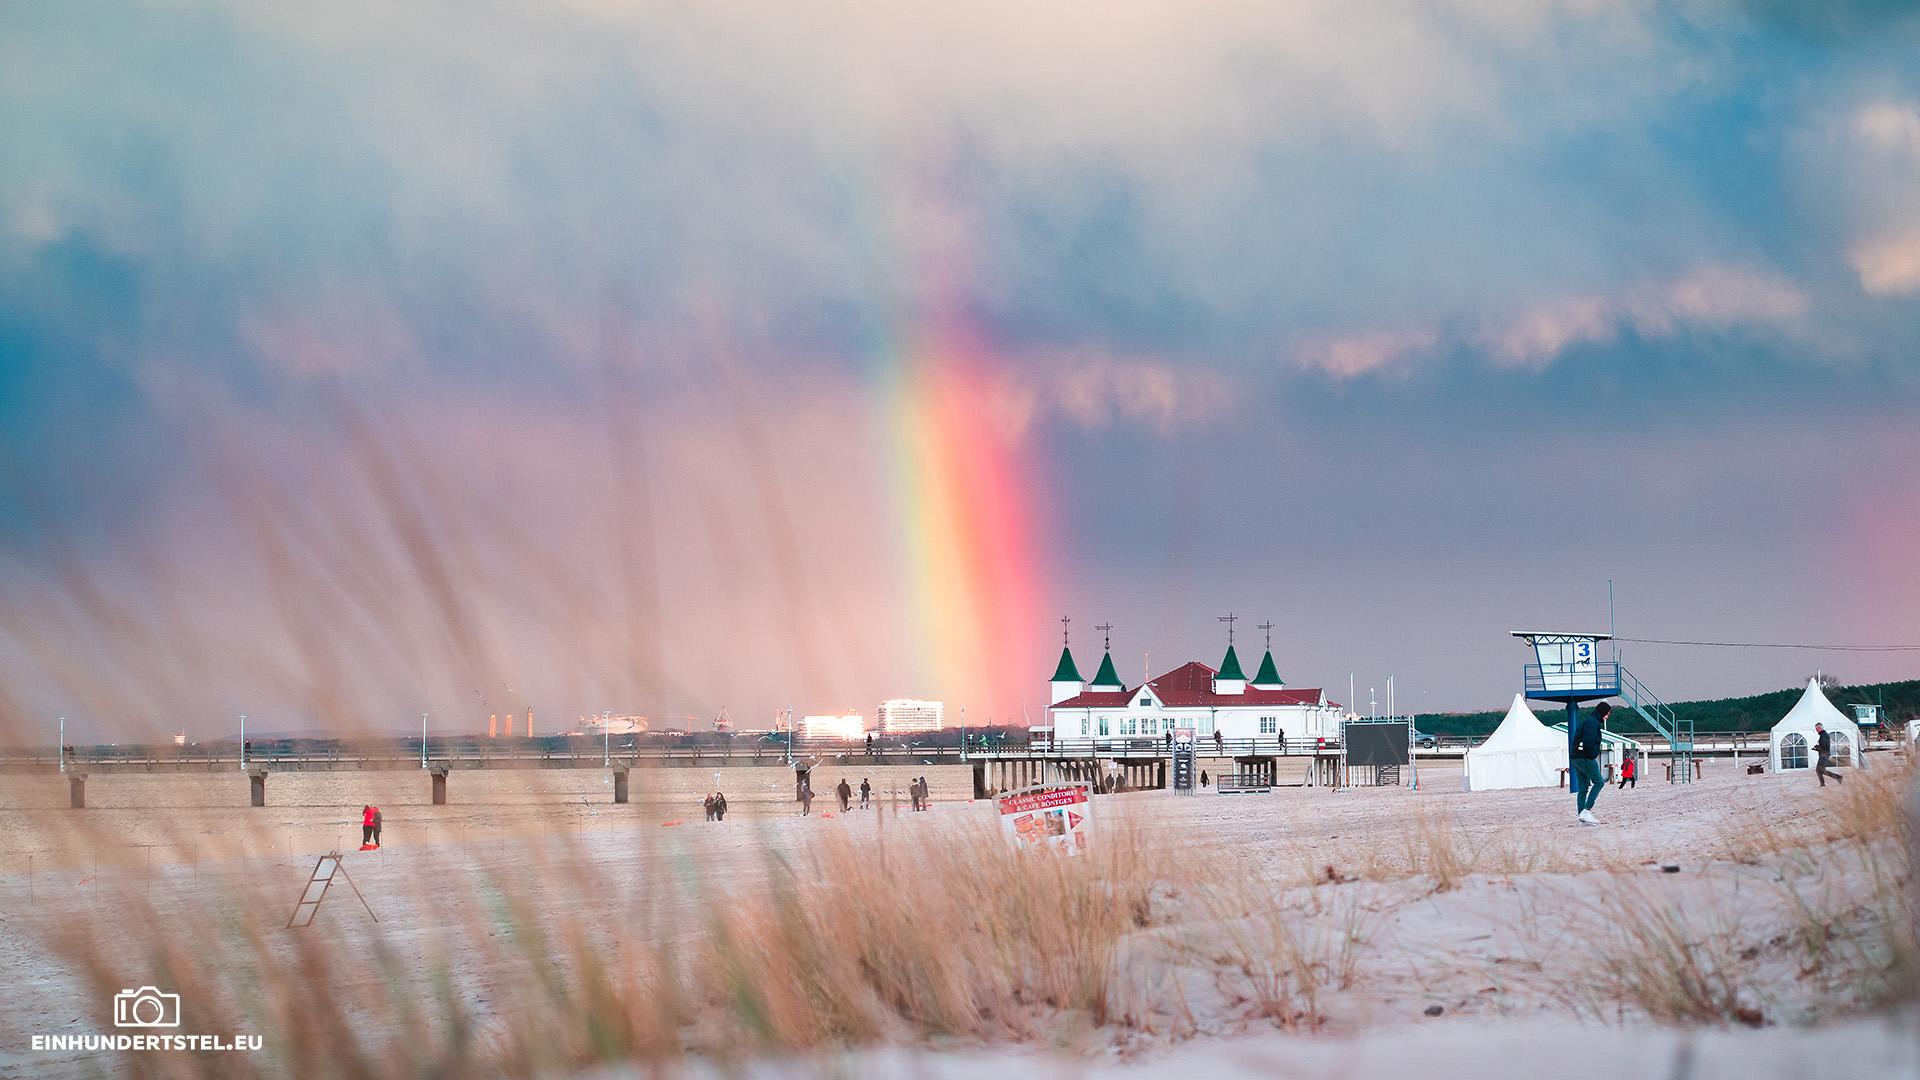 Regenbogen hinter der Seebrücke Ahlbeck auf Usedom.